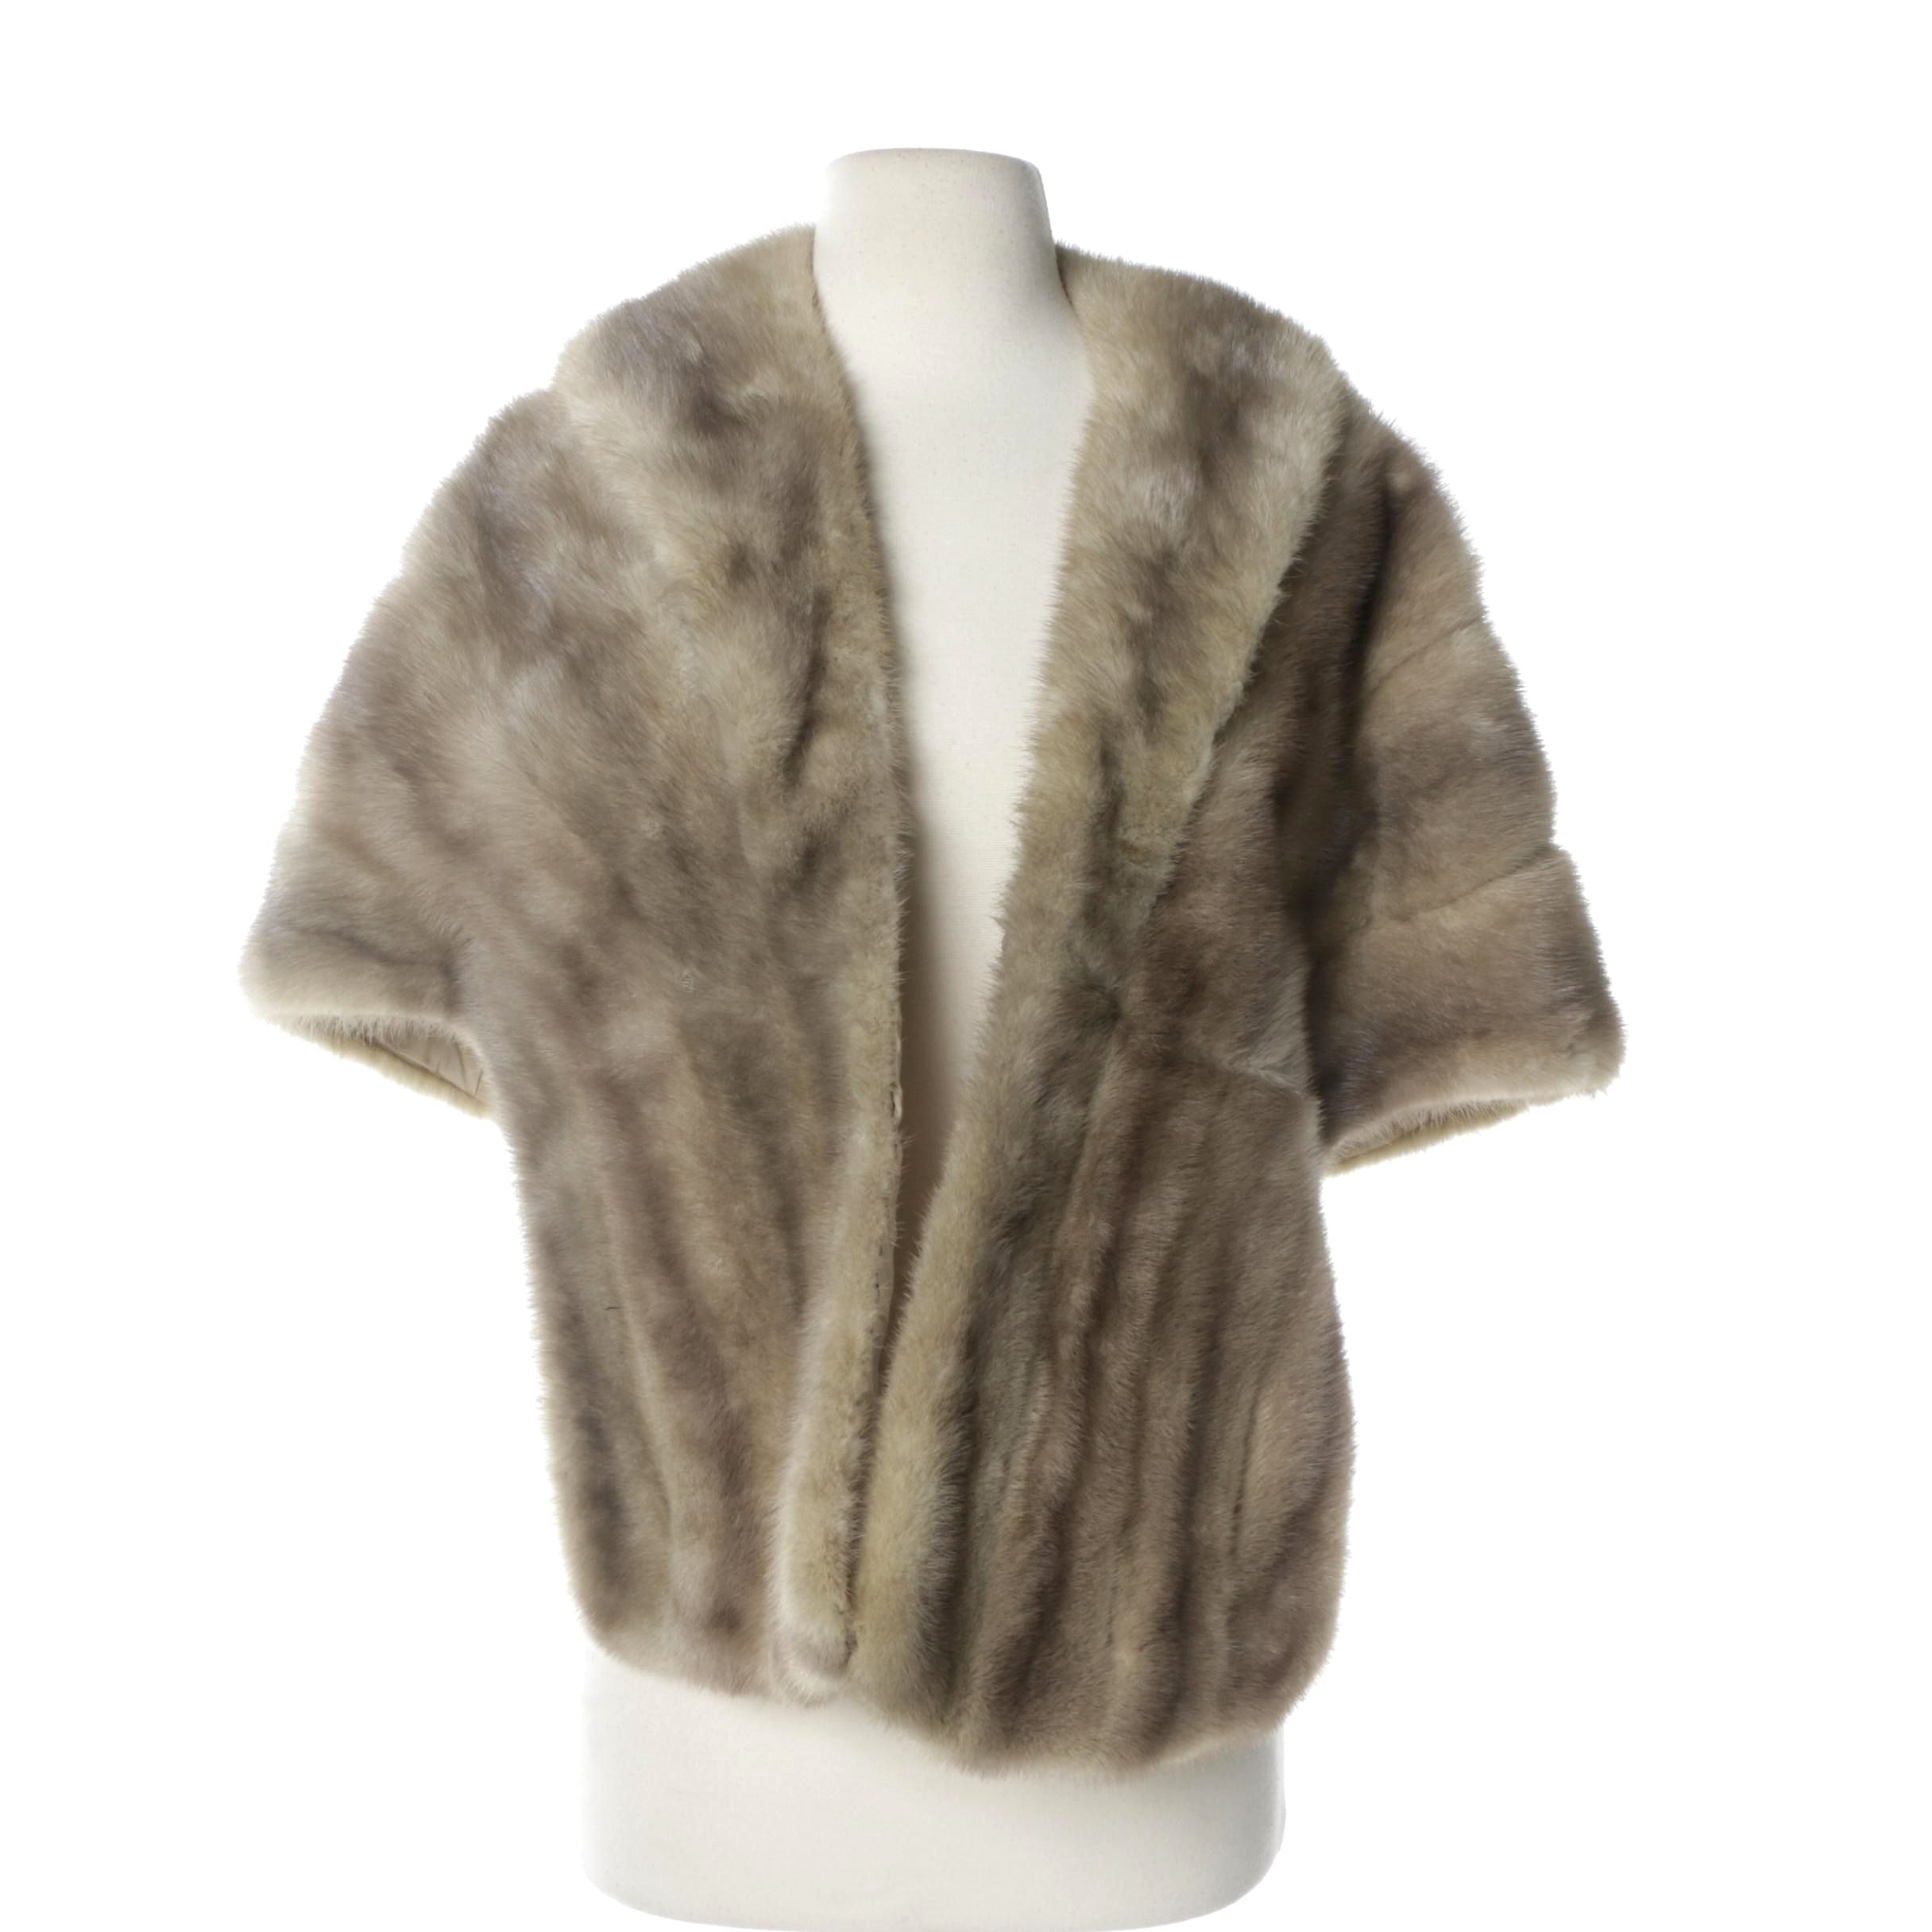 Vintage Grey Mink Fur Stole